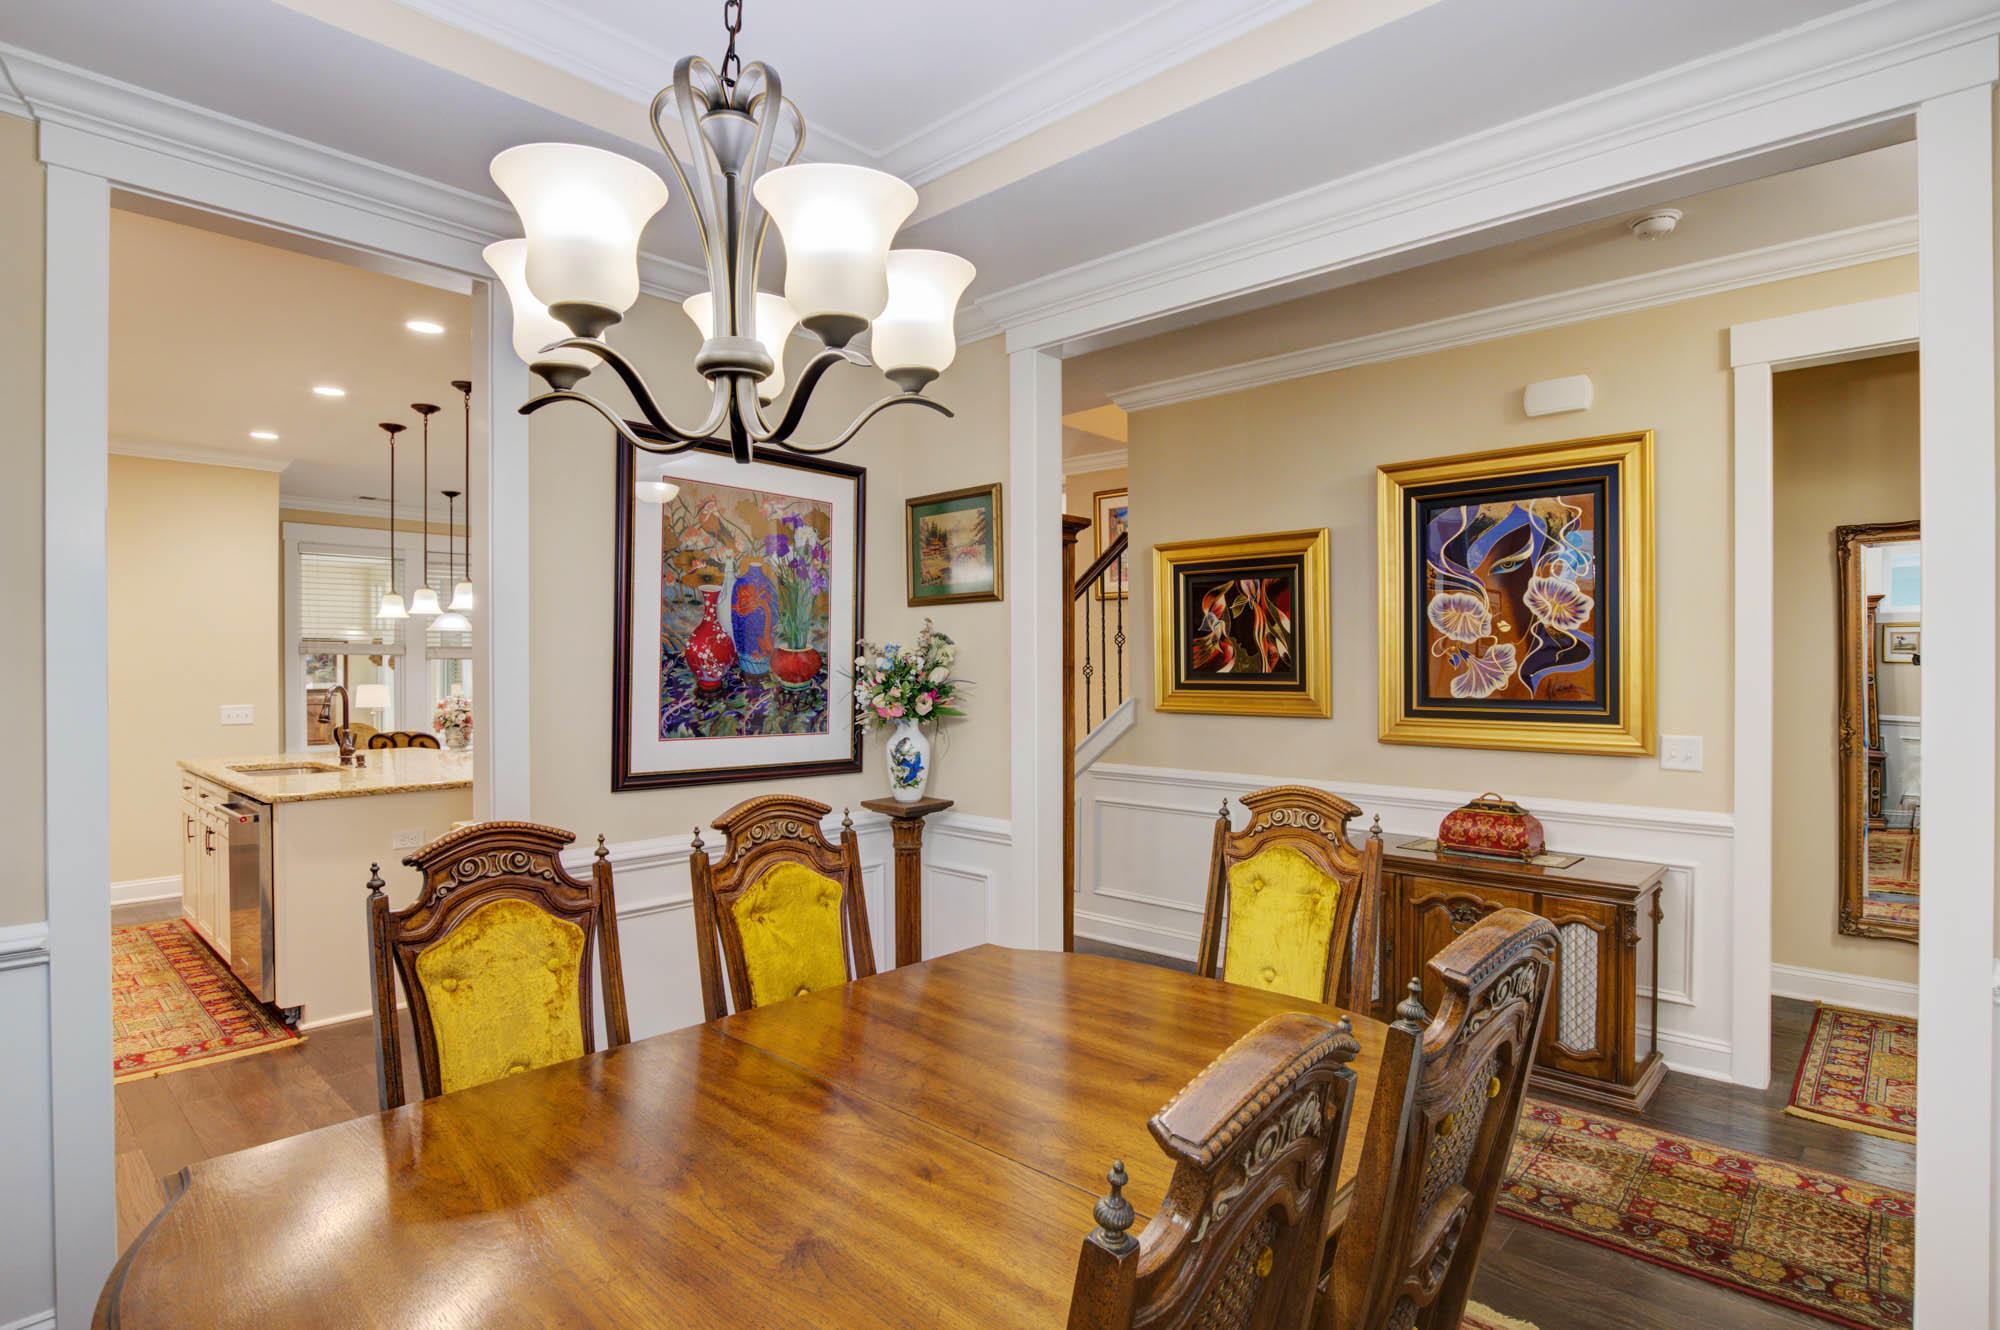 Carolina Bay Homes For Sale - 1850 Grovehurst, Charleston, SC - 3